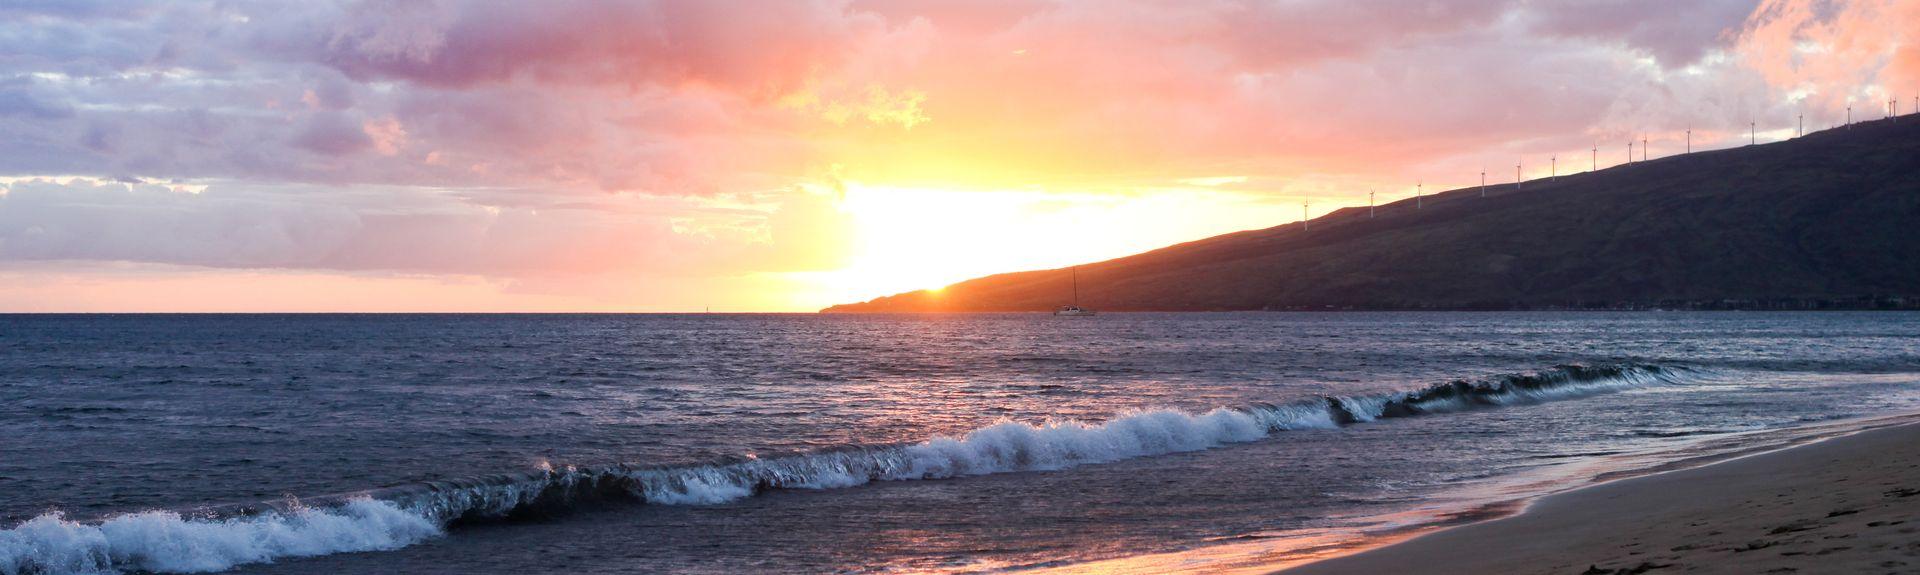 Kihei Sands (Kihei, Hawaï, Verenigde Staten)